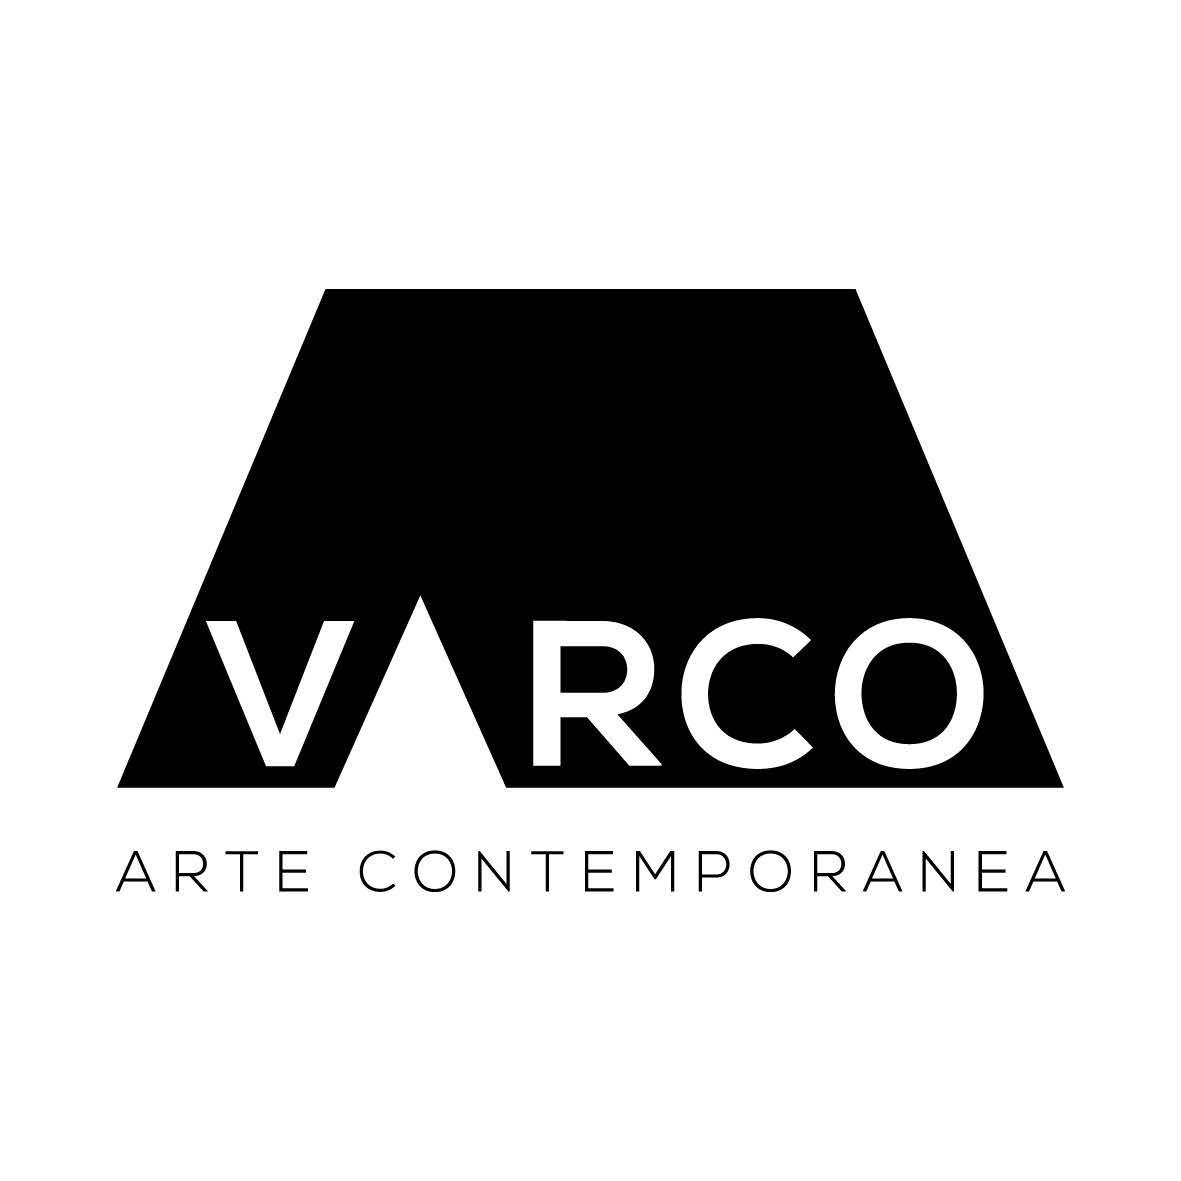 V.AR.CO - verdiartecontemporanea - official logo